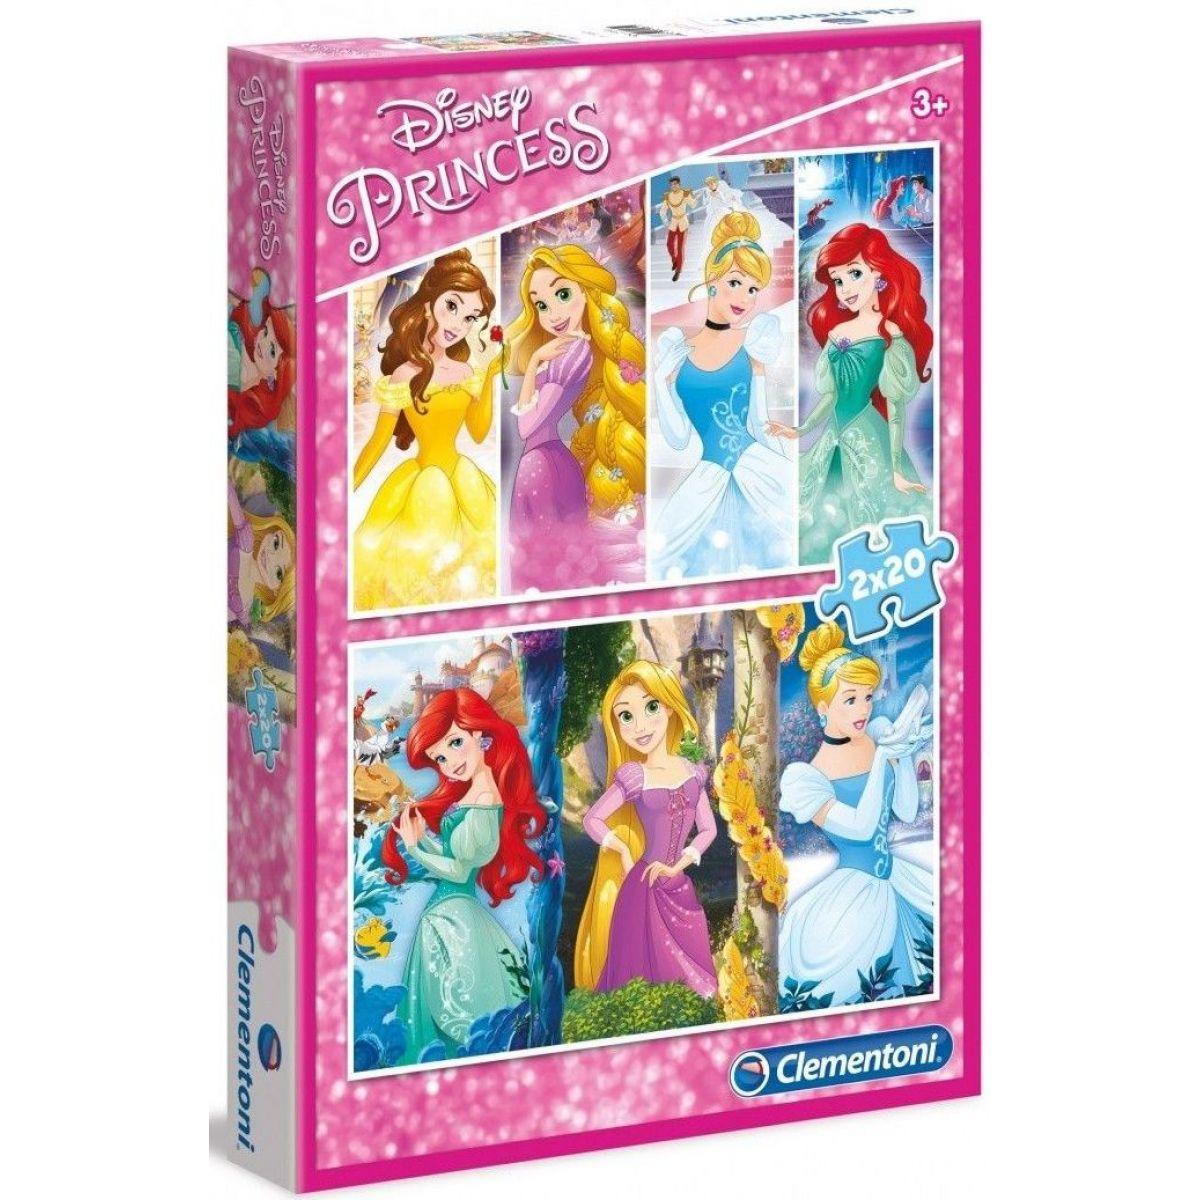 Clementoni Disney Princess Puzzle Princezny 2 x 20 dílků